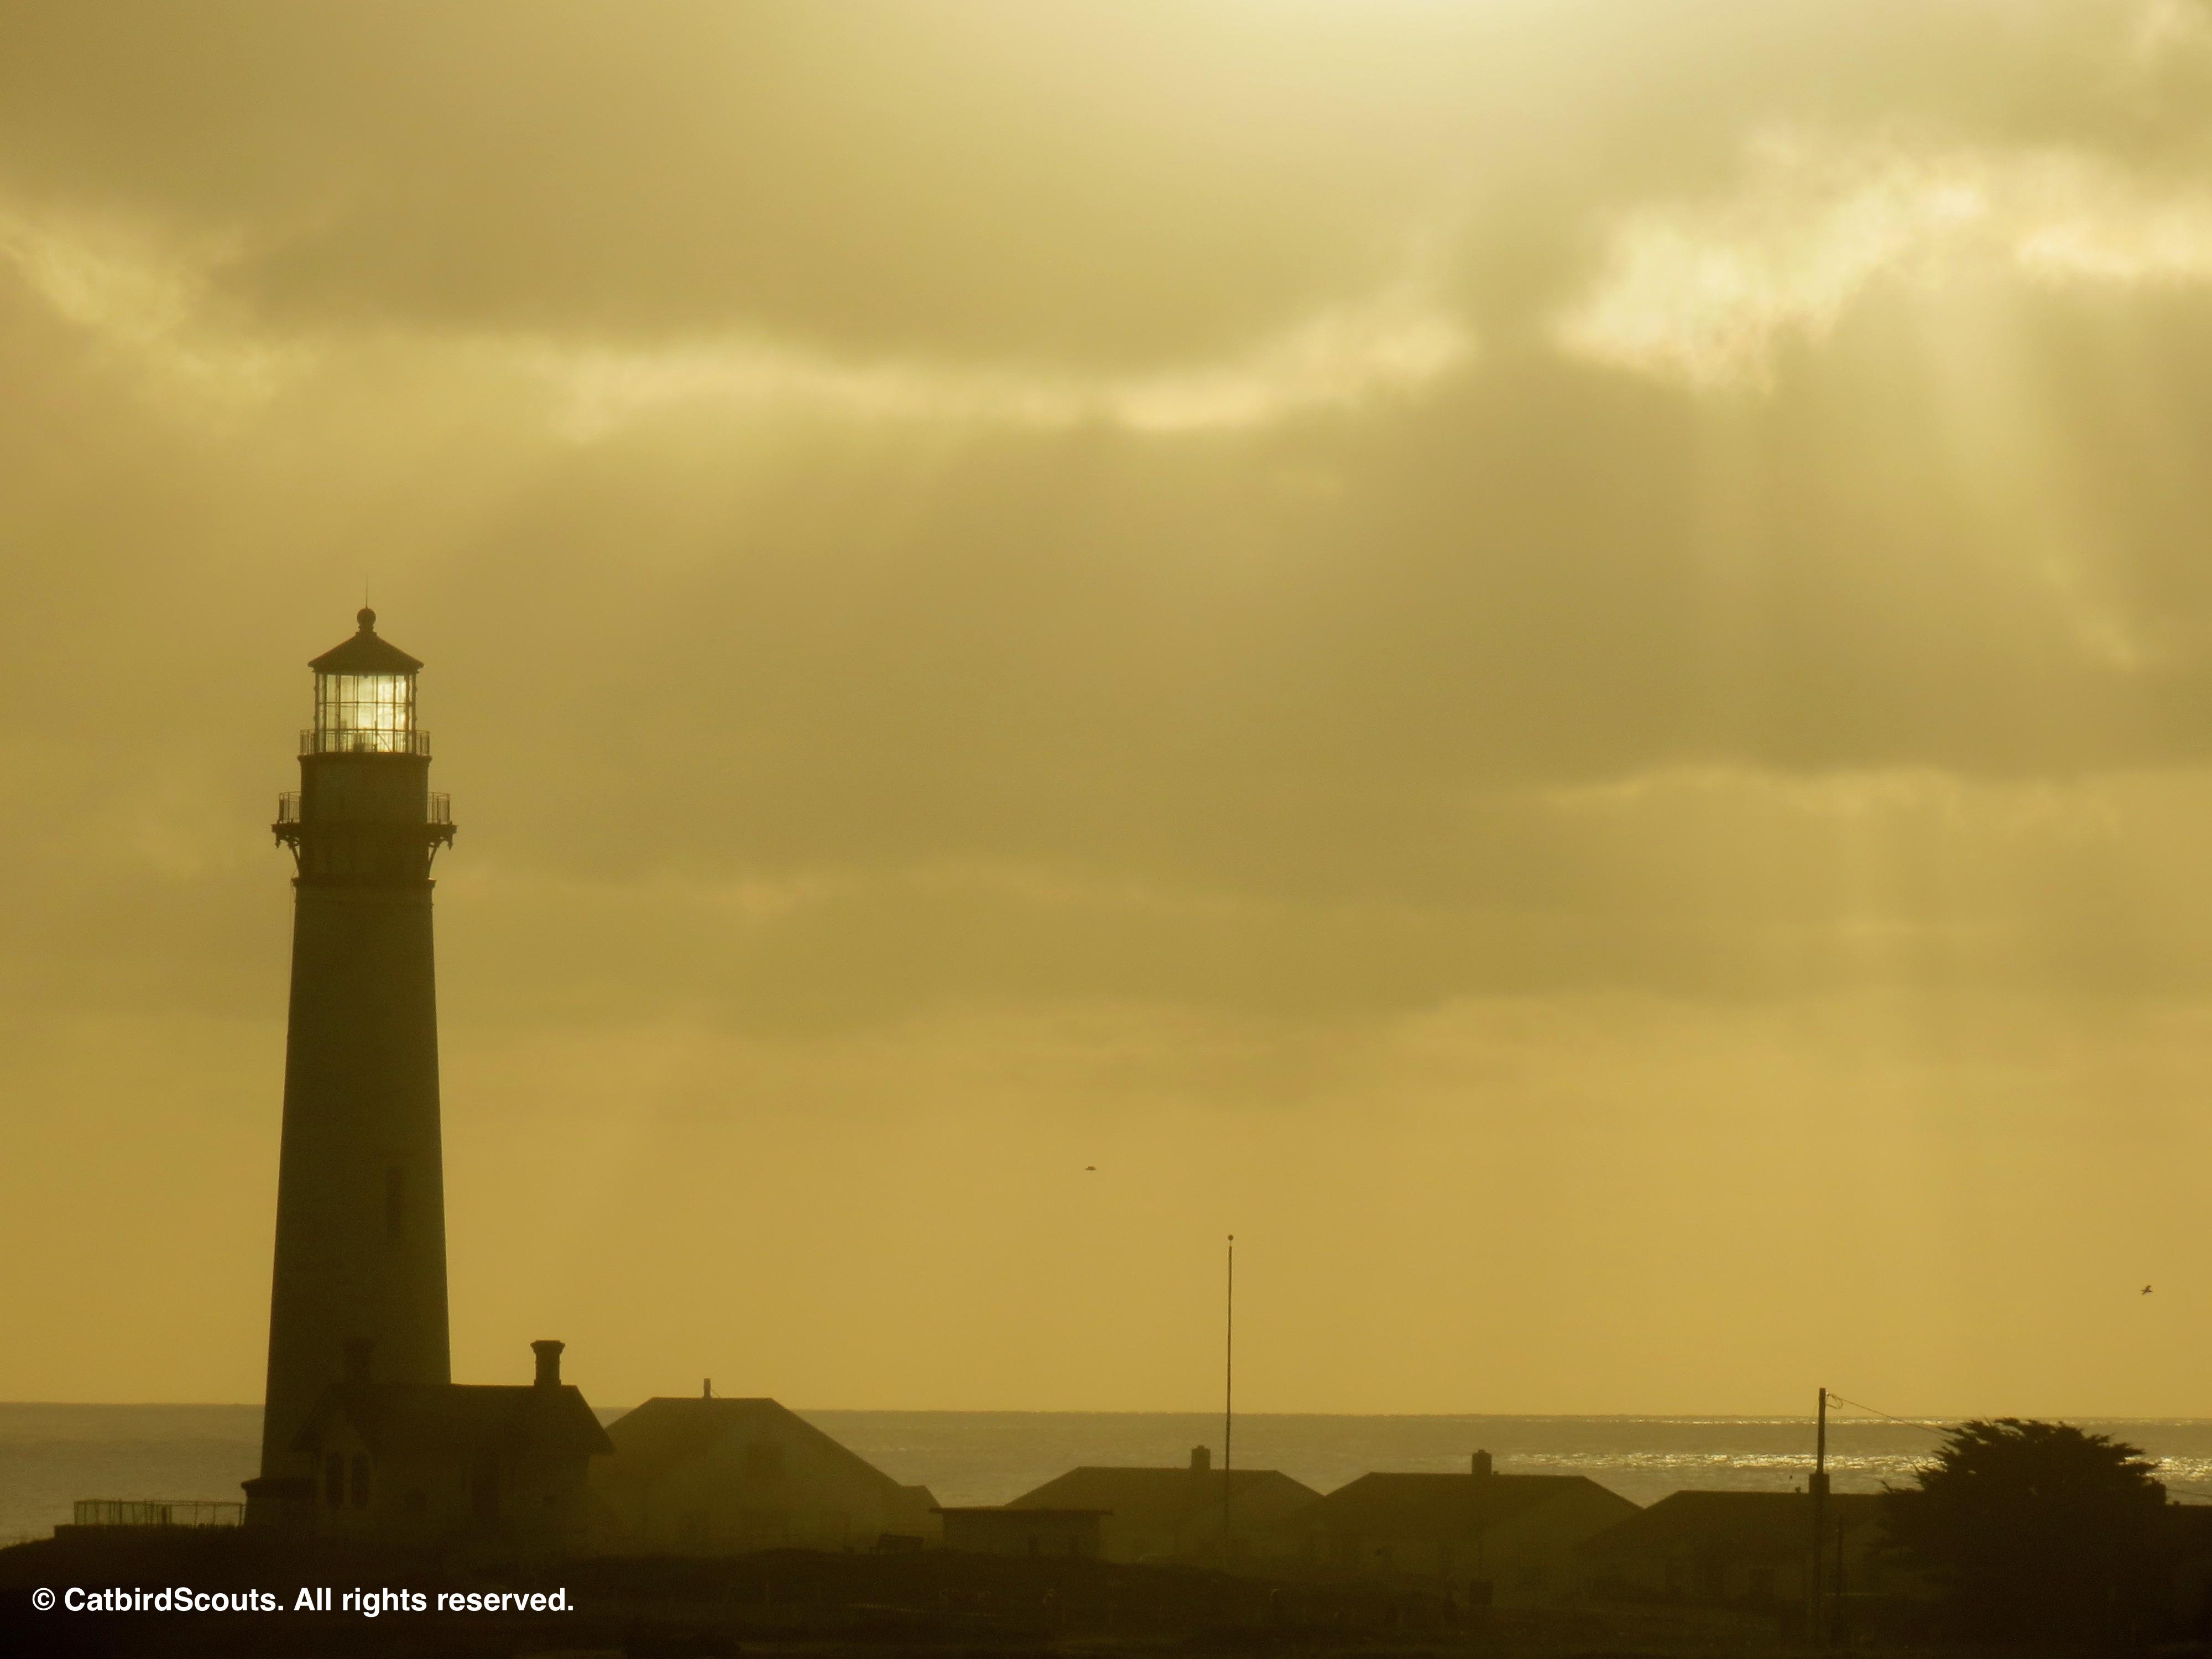 Lighthouse-2-Catbird-Scouts